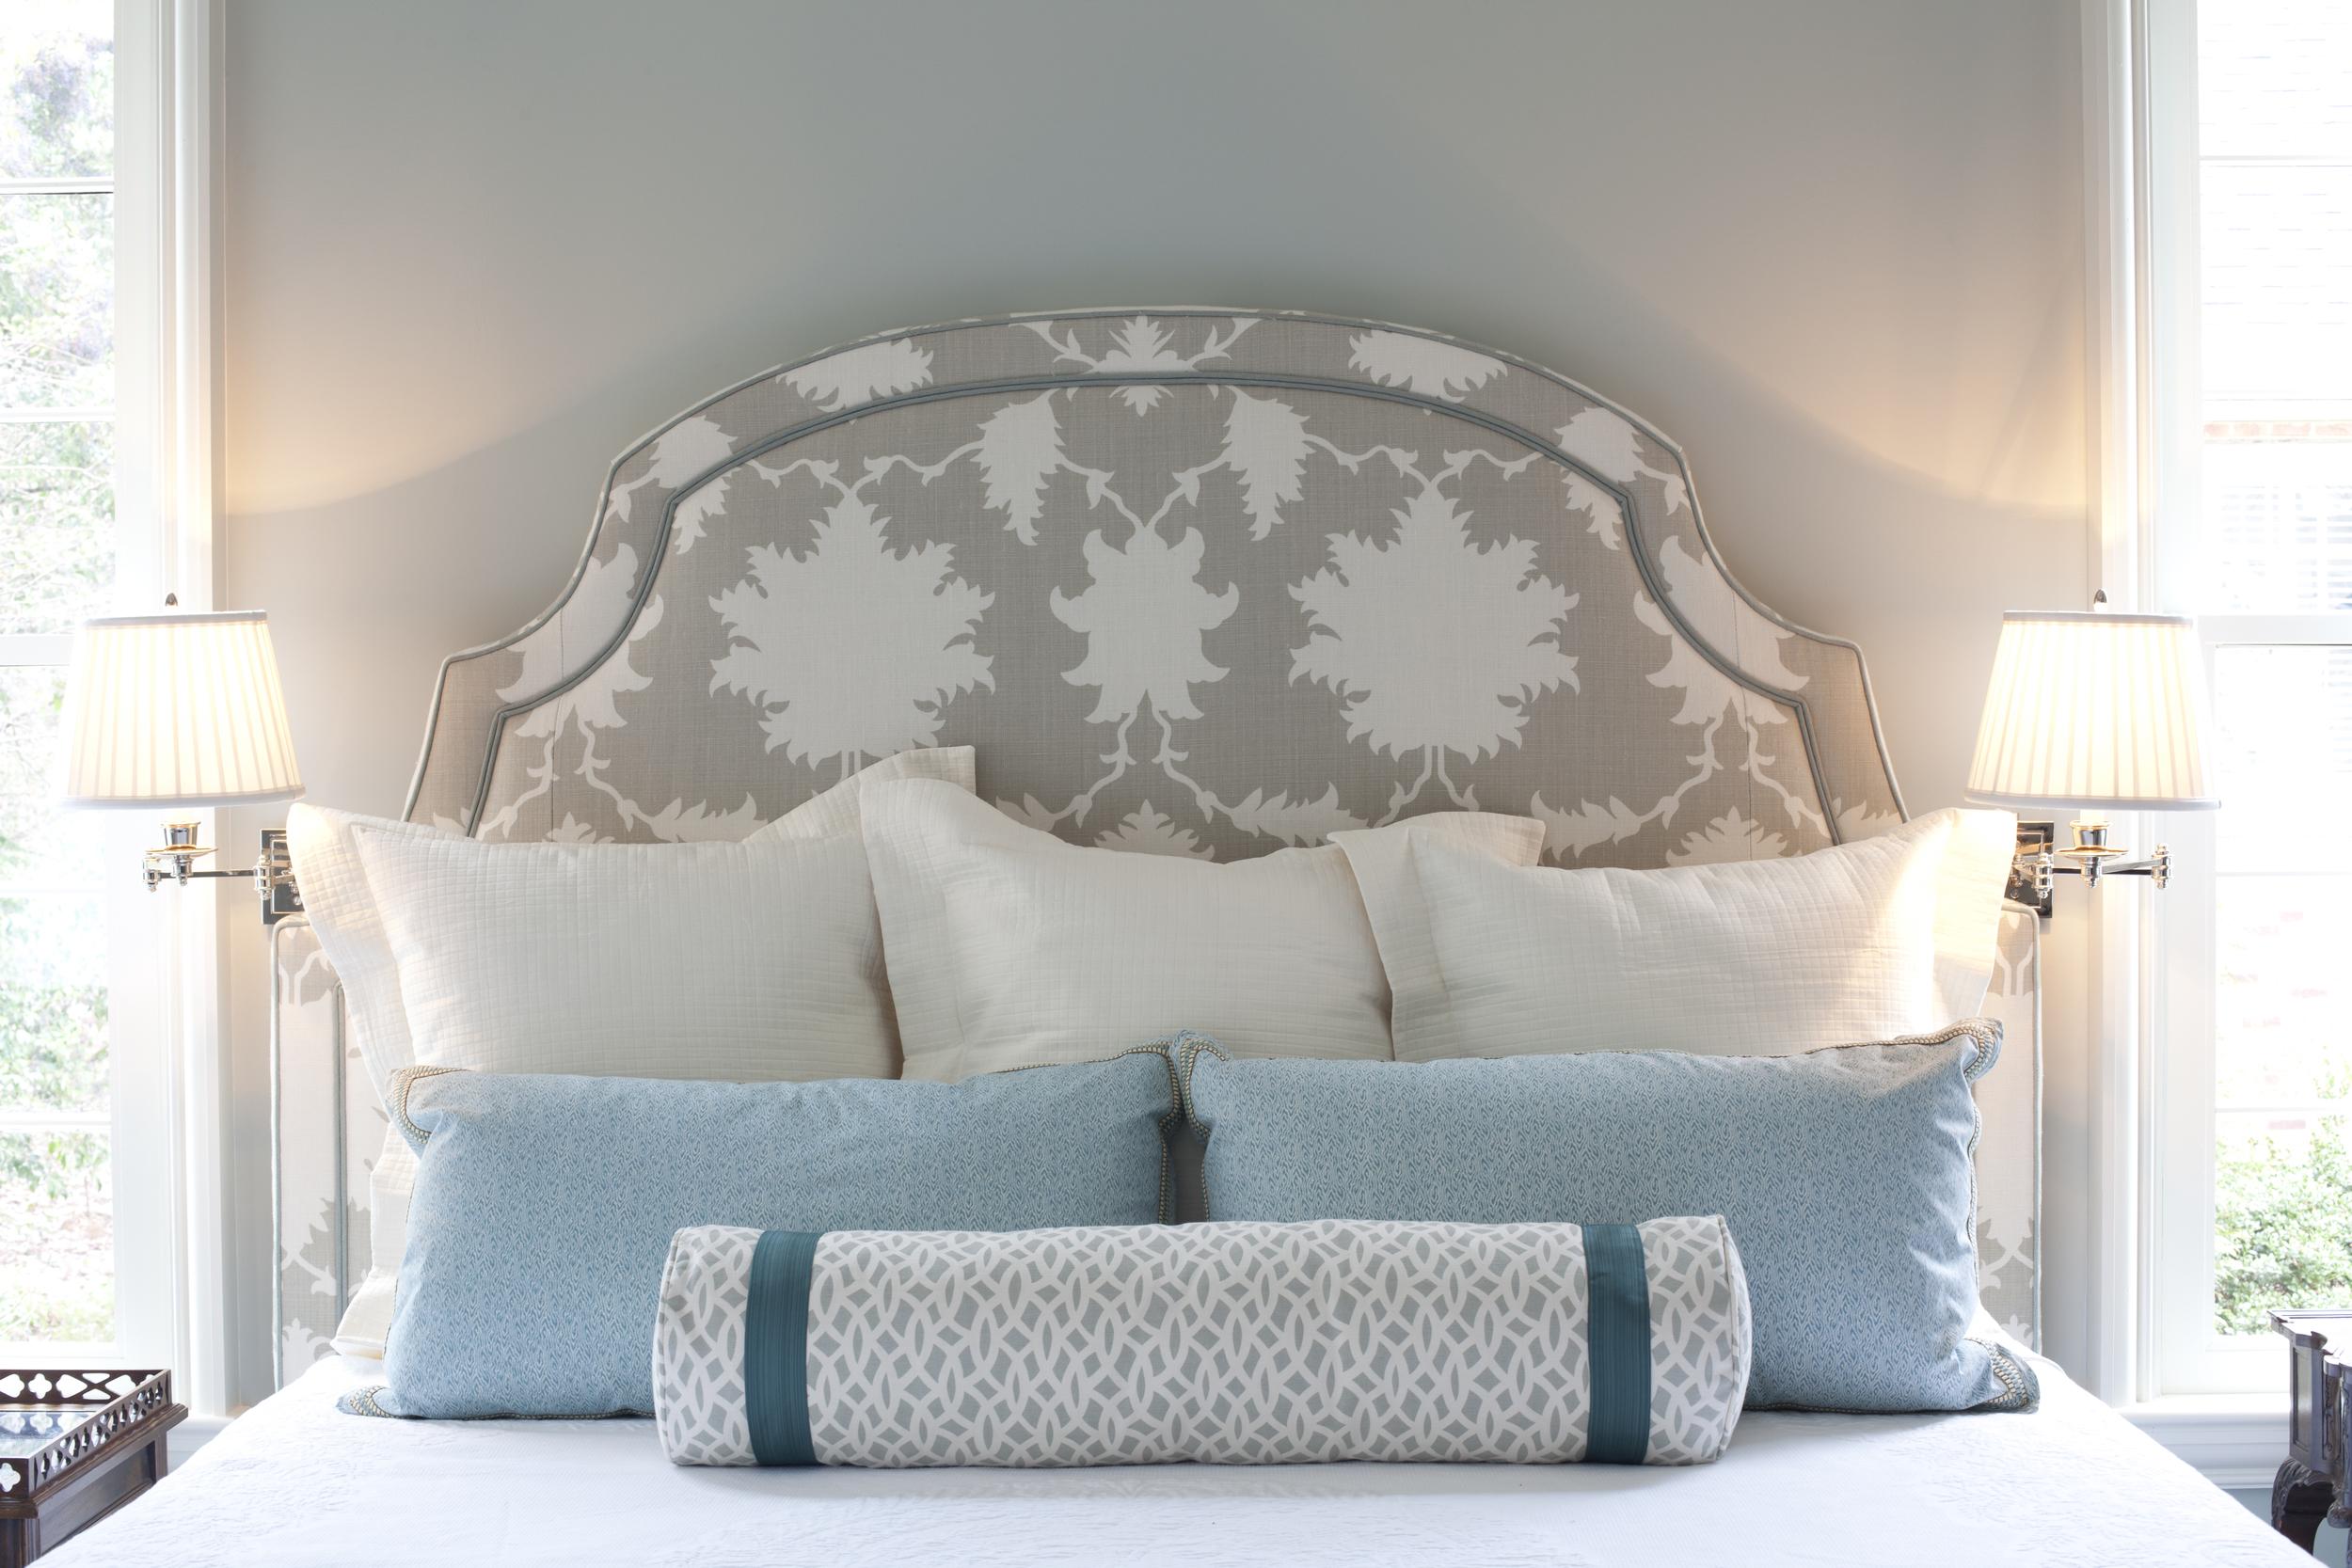 Bedroom-071.jpg